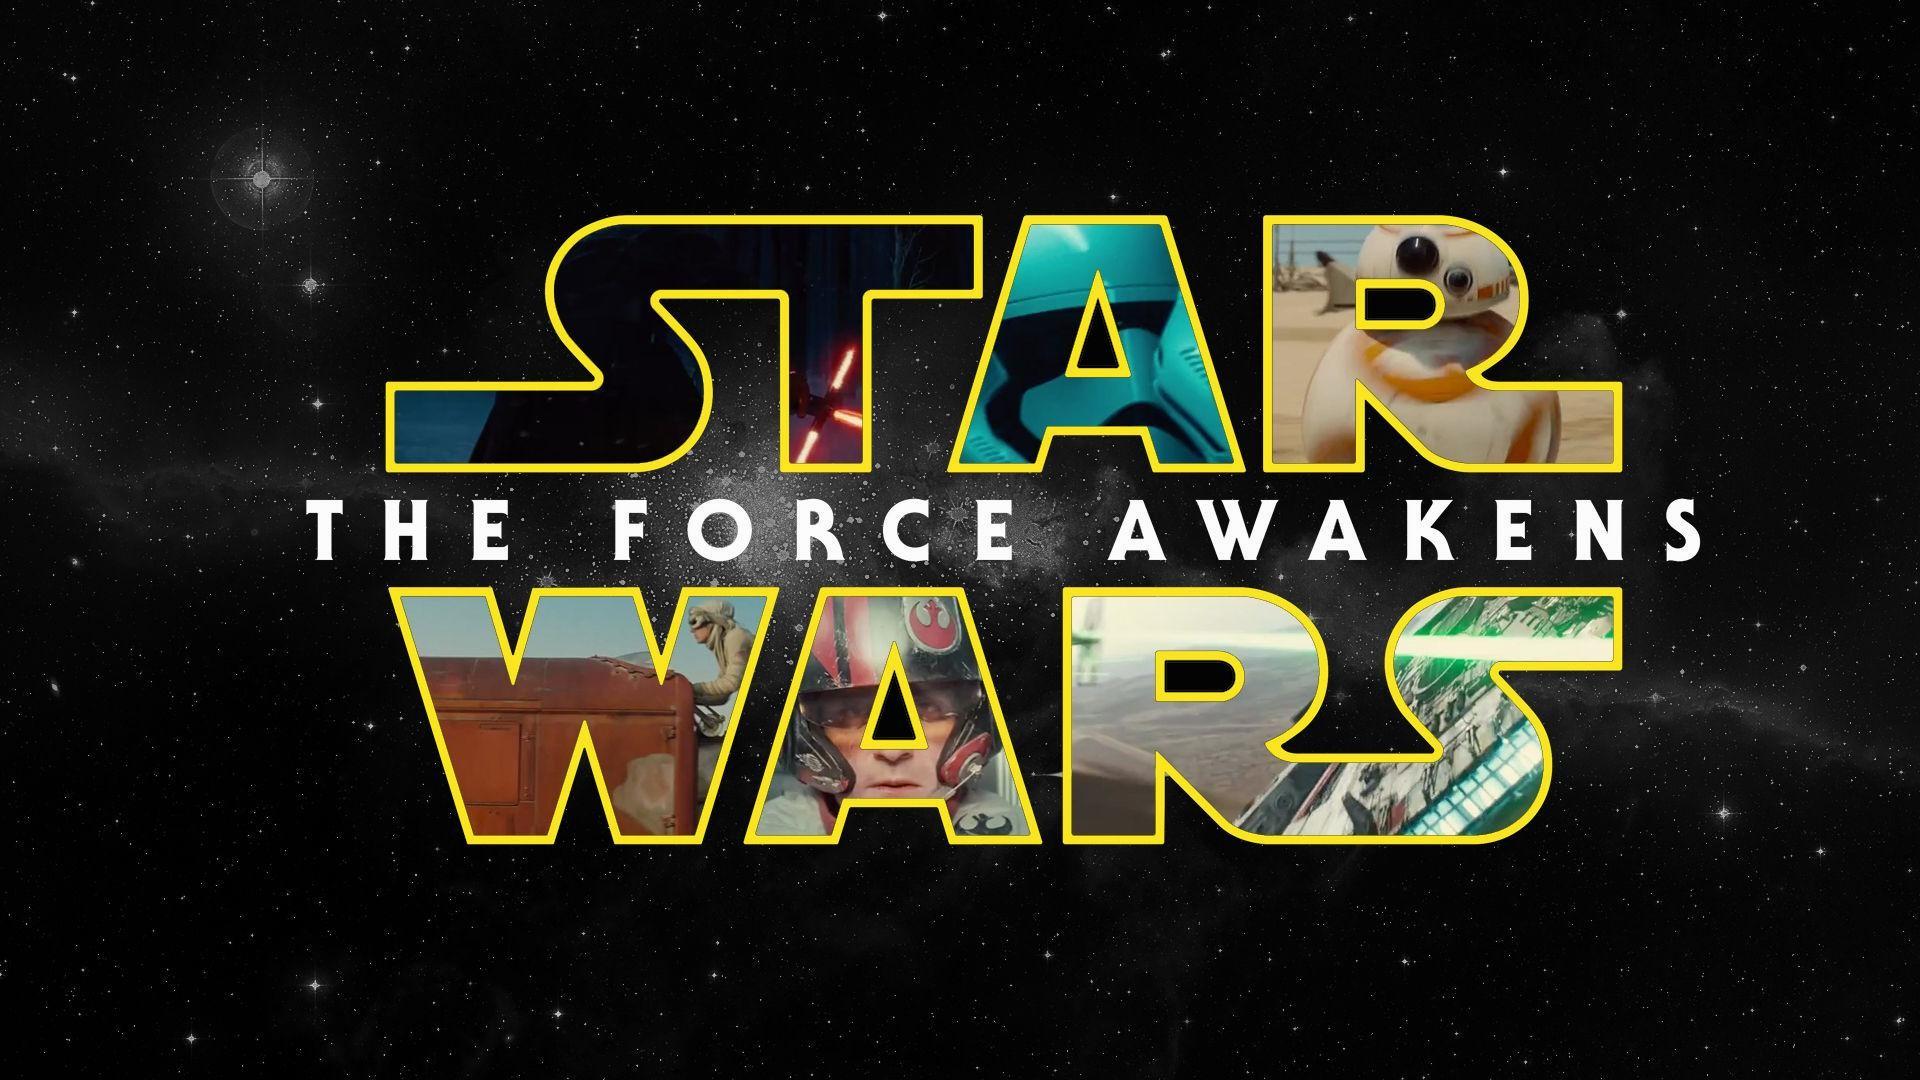 Star-Wars-Logo-.-1920%C3%971080-wallpaper-